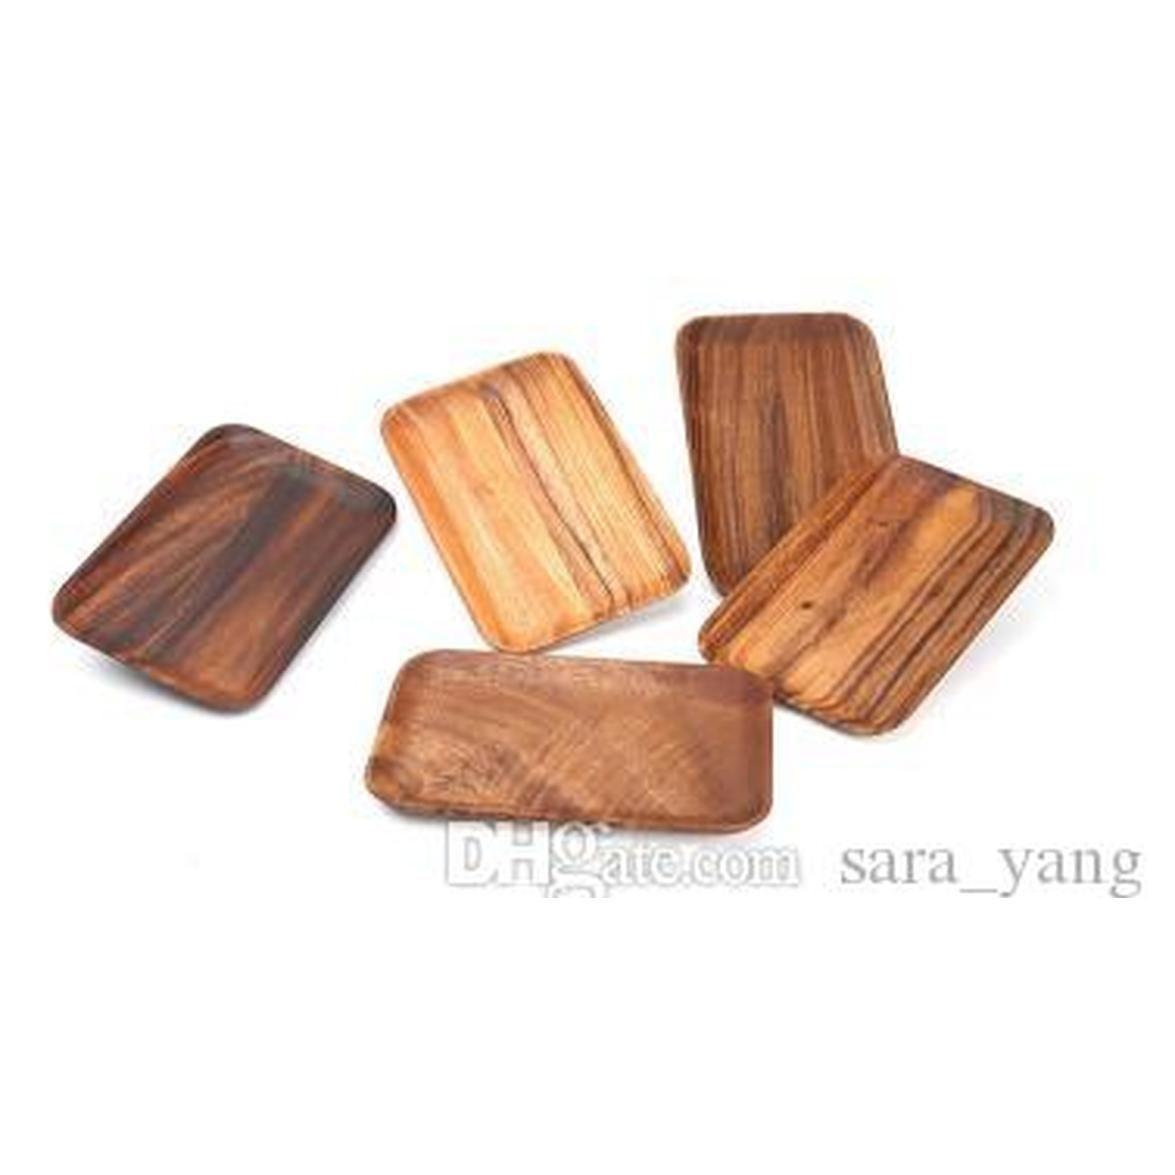 Wood Fruit Plates Rectangular Tray Dried Wood Trays Snack Candy Cake Holder Wooden Storage Dishes Kit wmtMBy toys2010